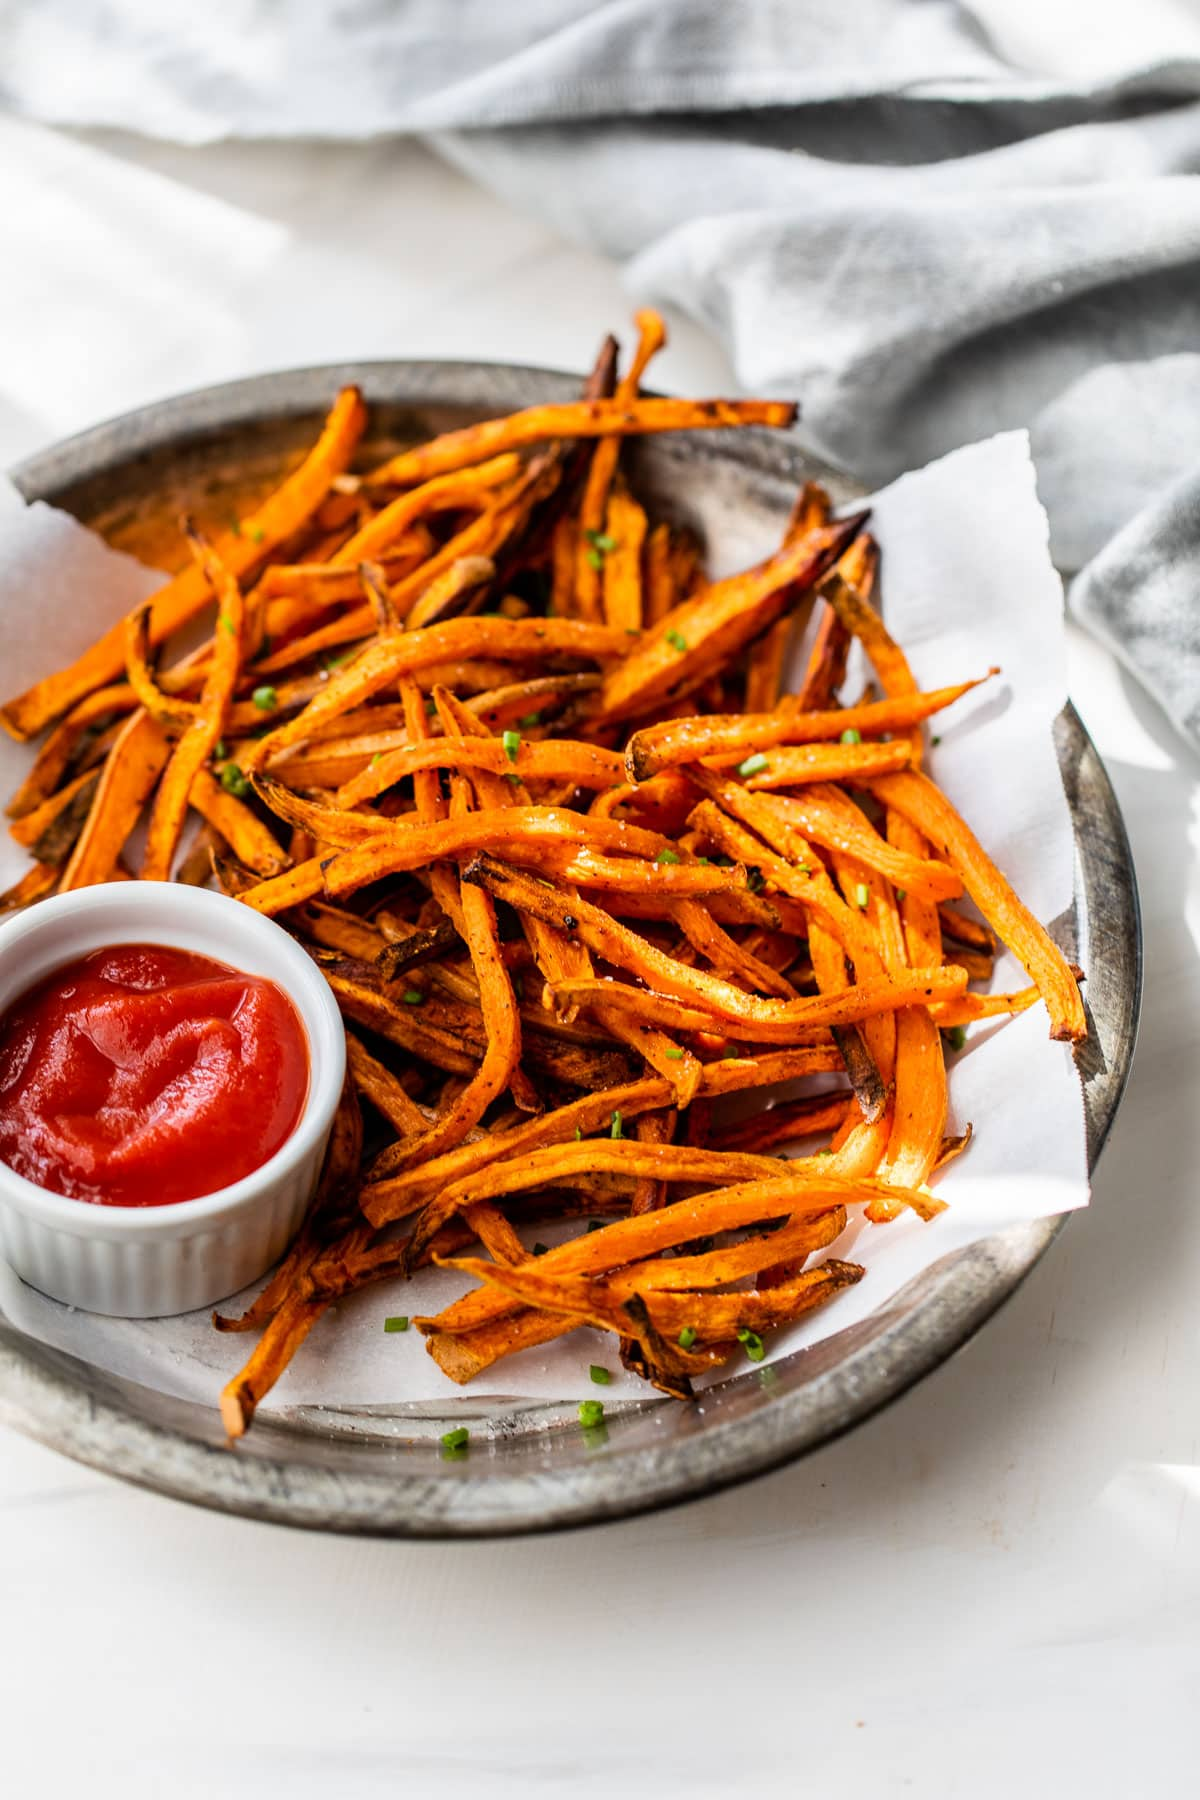 crispy air fryer sweet potato fries on a plate